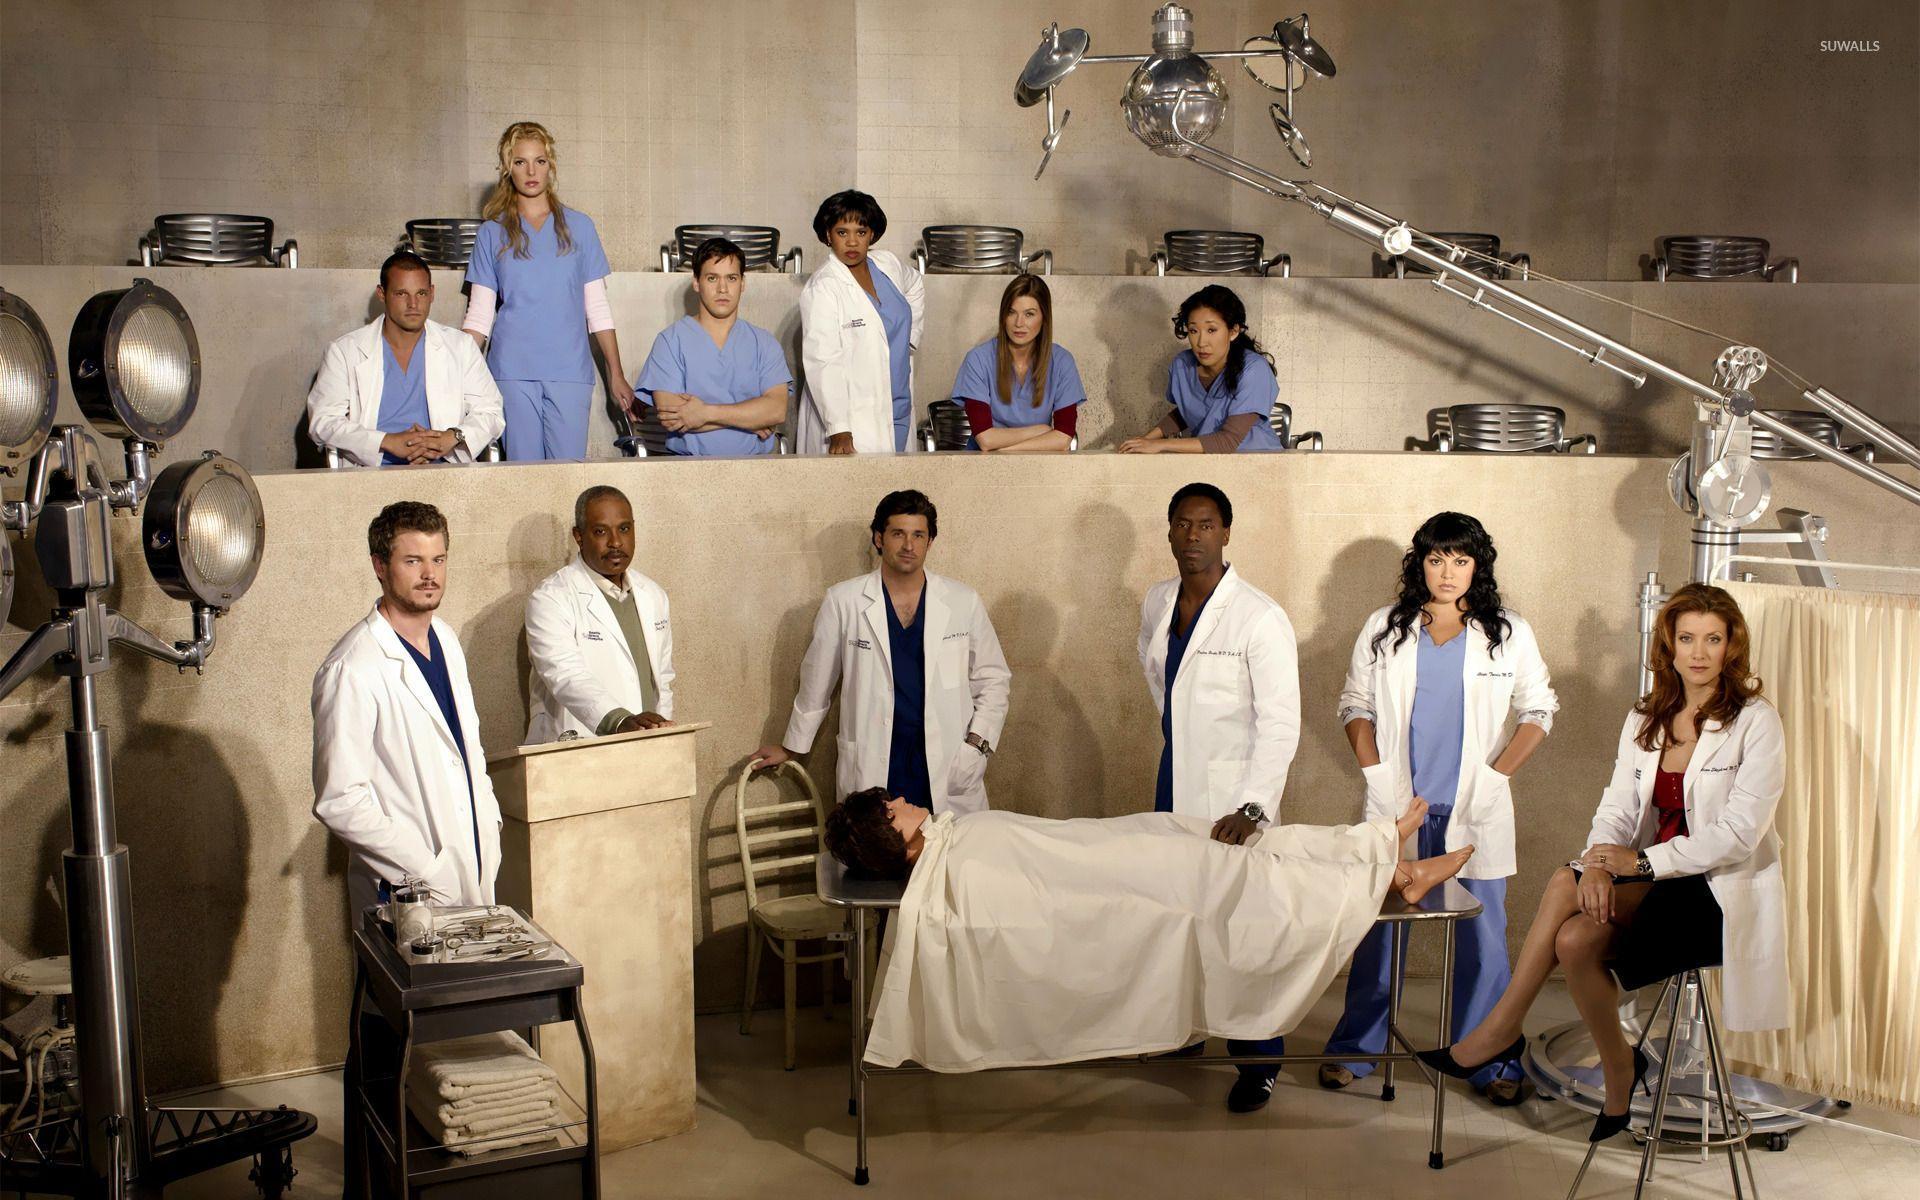 Grey's Anatomy Wallpapers - Wallpaper Cave